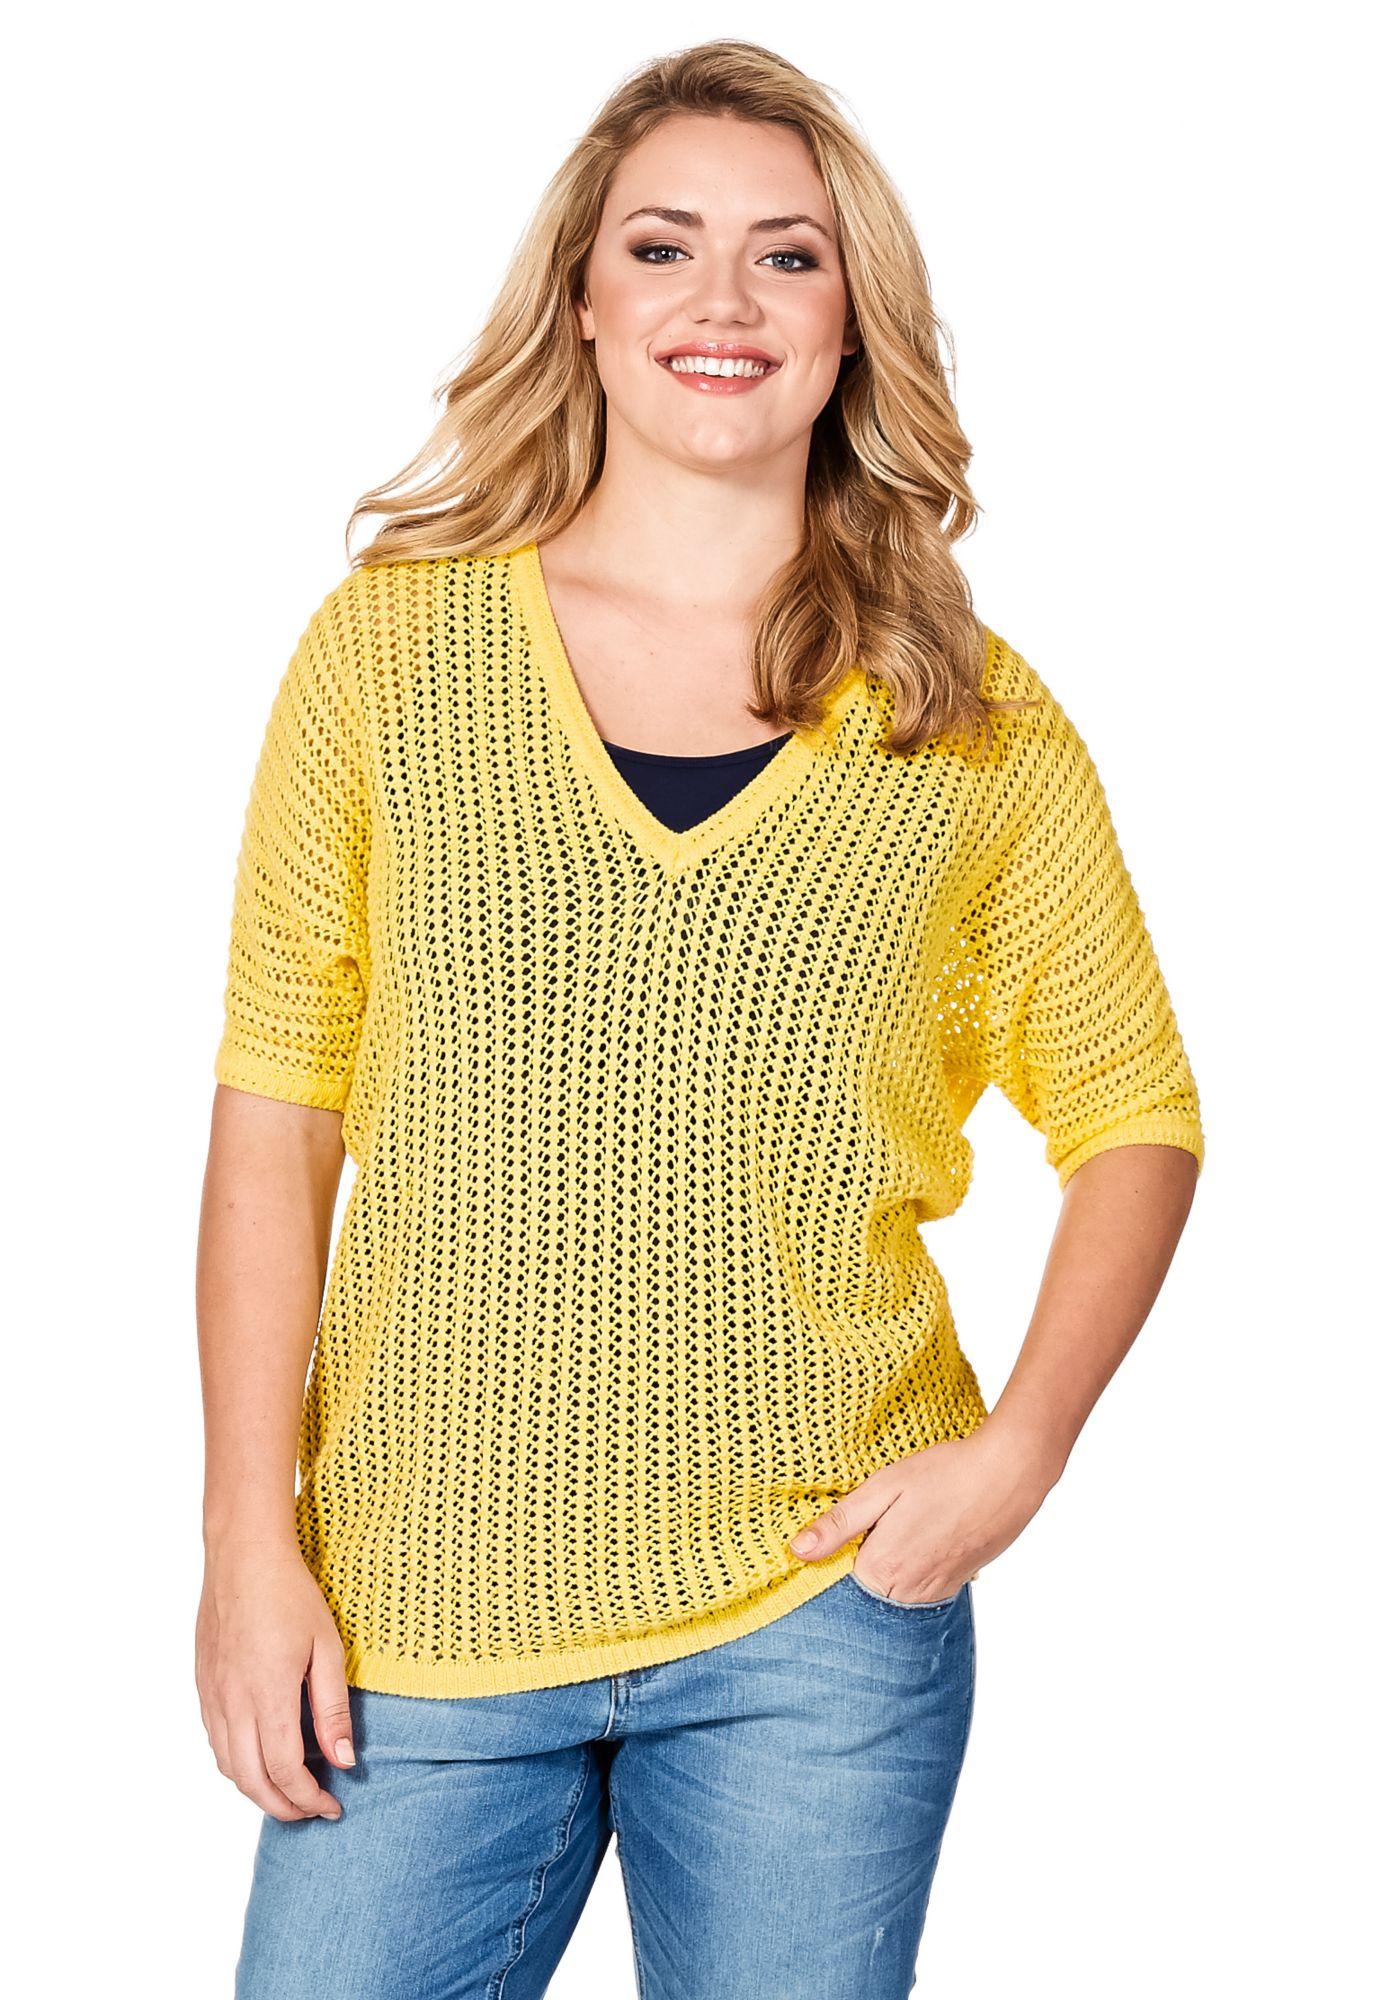 S.OLIVER Sweatshirt gelbgelb 40/42;44/46;48/50;52/54;56/58 gelb